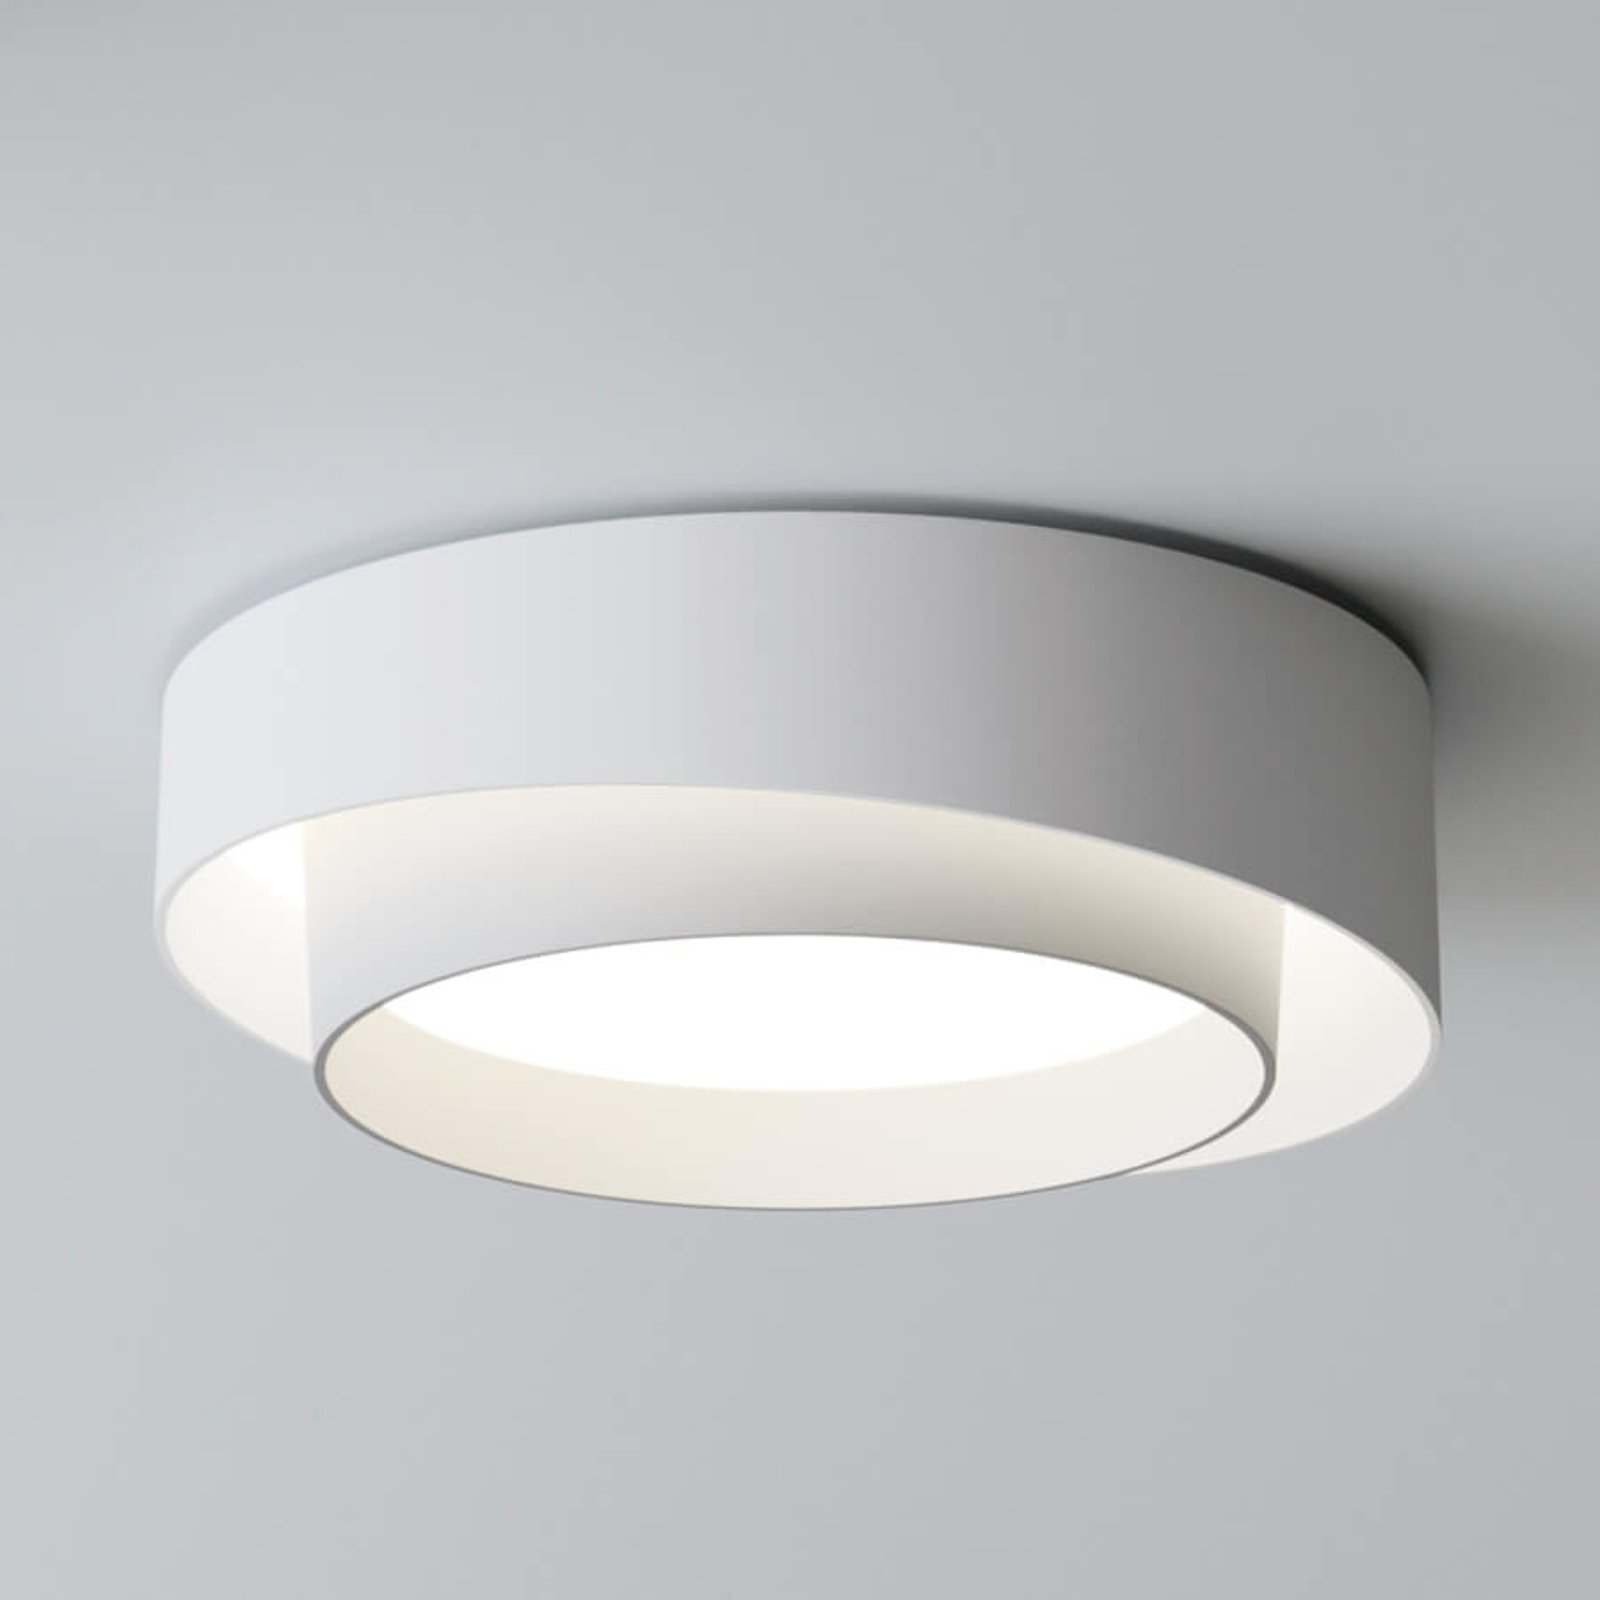 Centric hvit LED designertaklampe